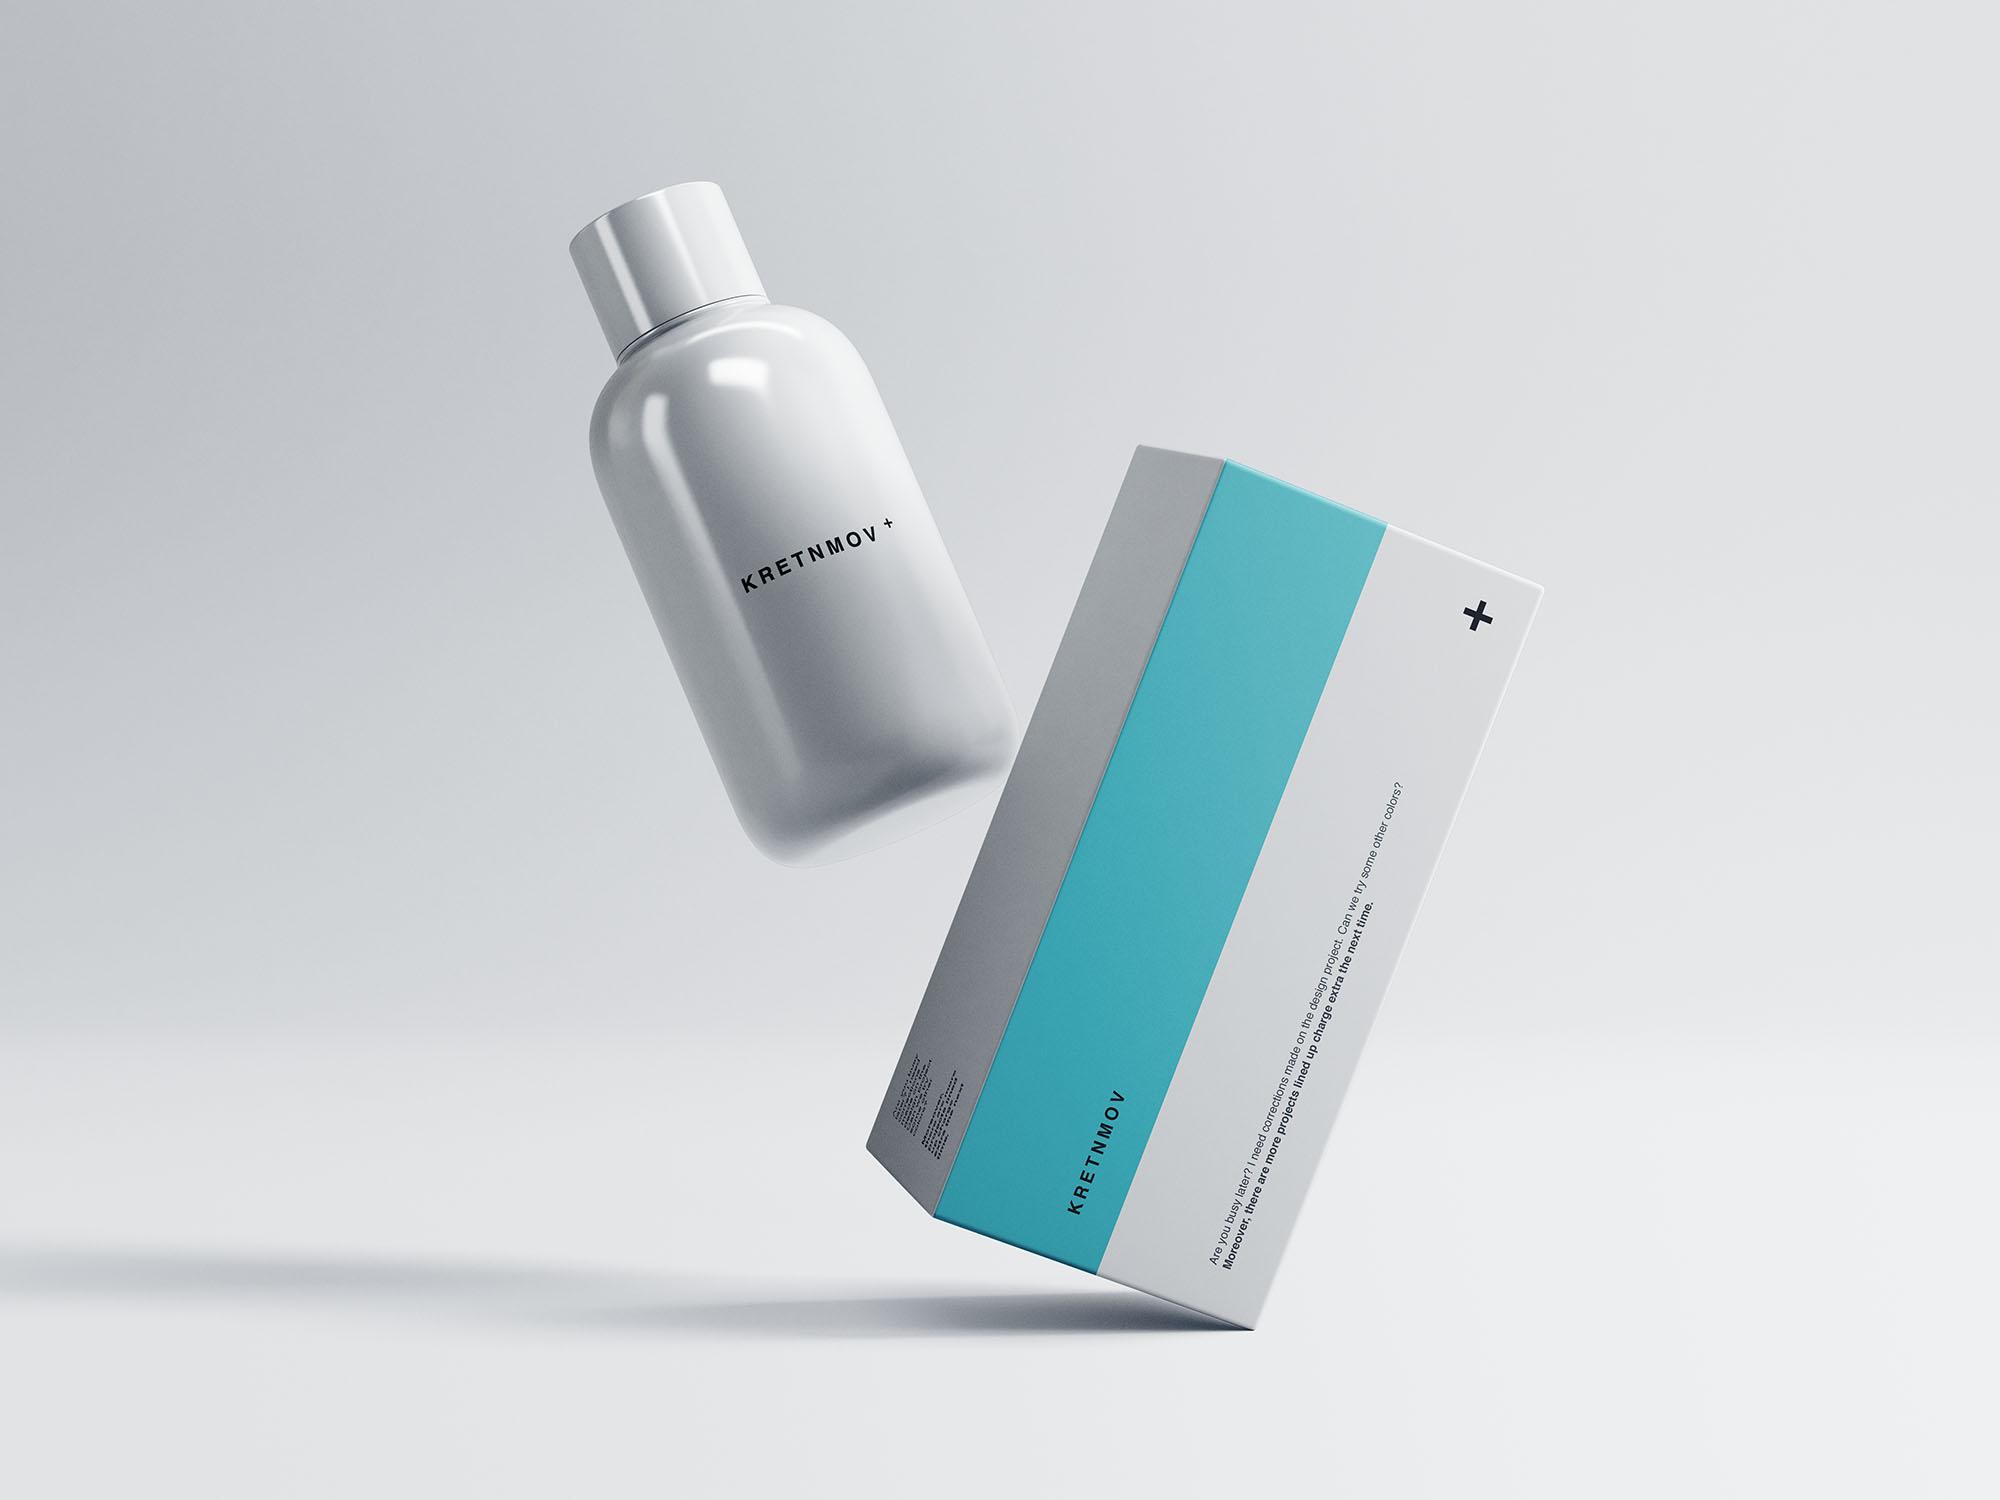 Free Medical Box Bottle Packaging Mockup Free Package Mockups